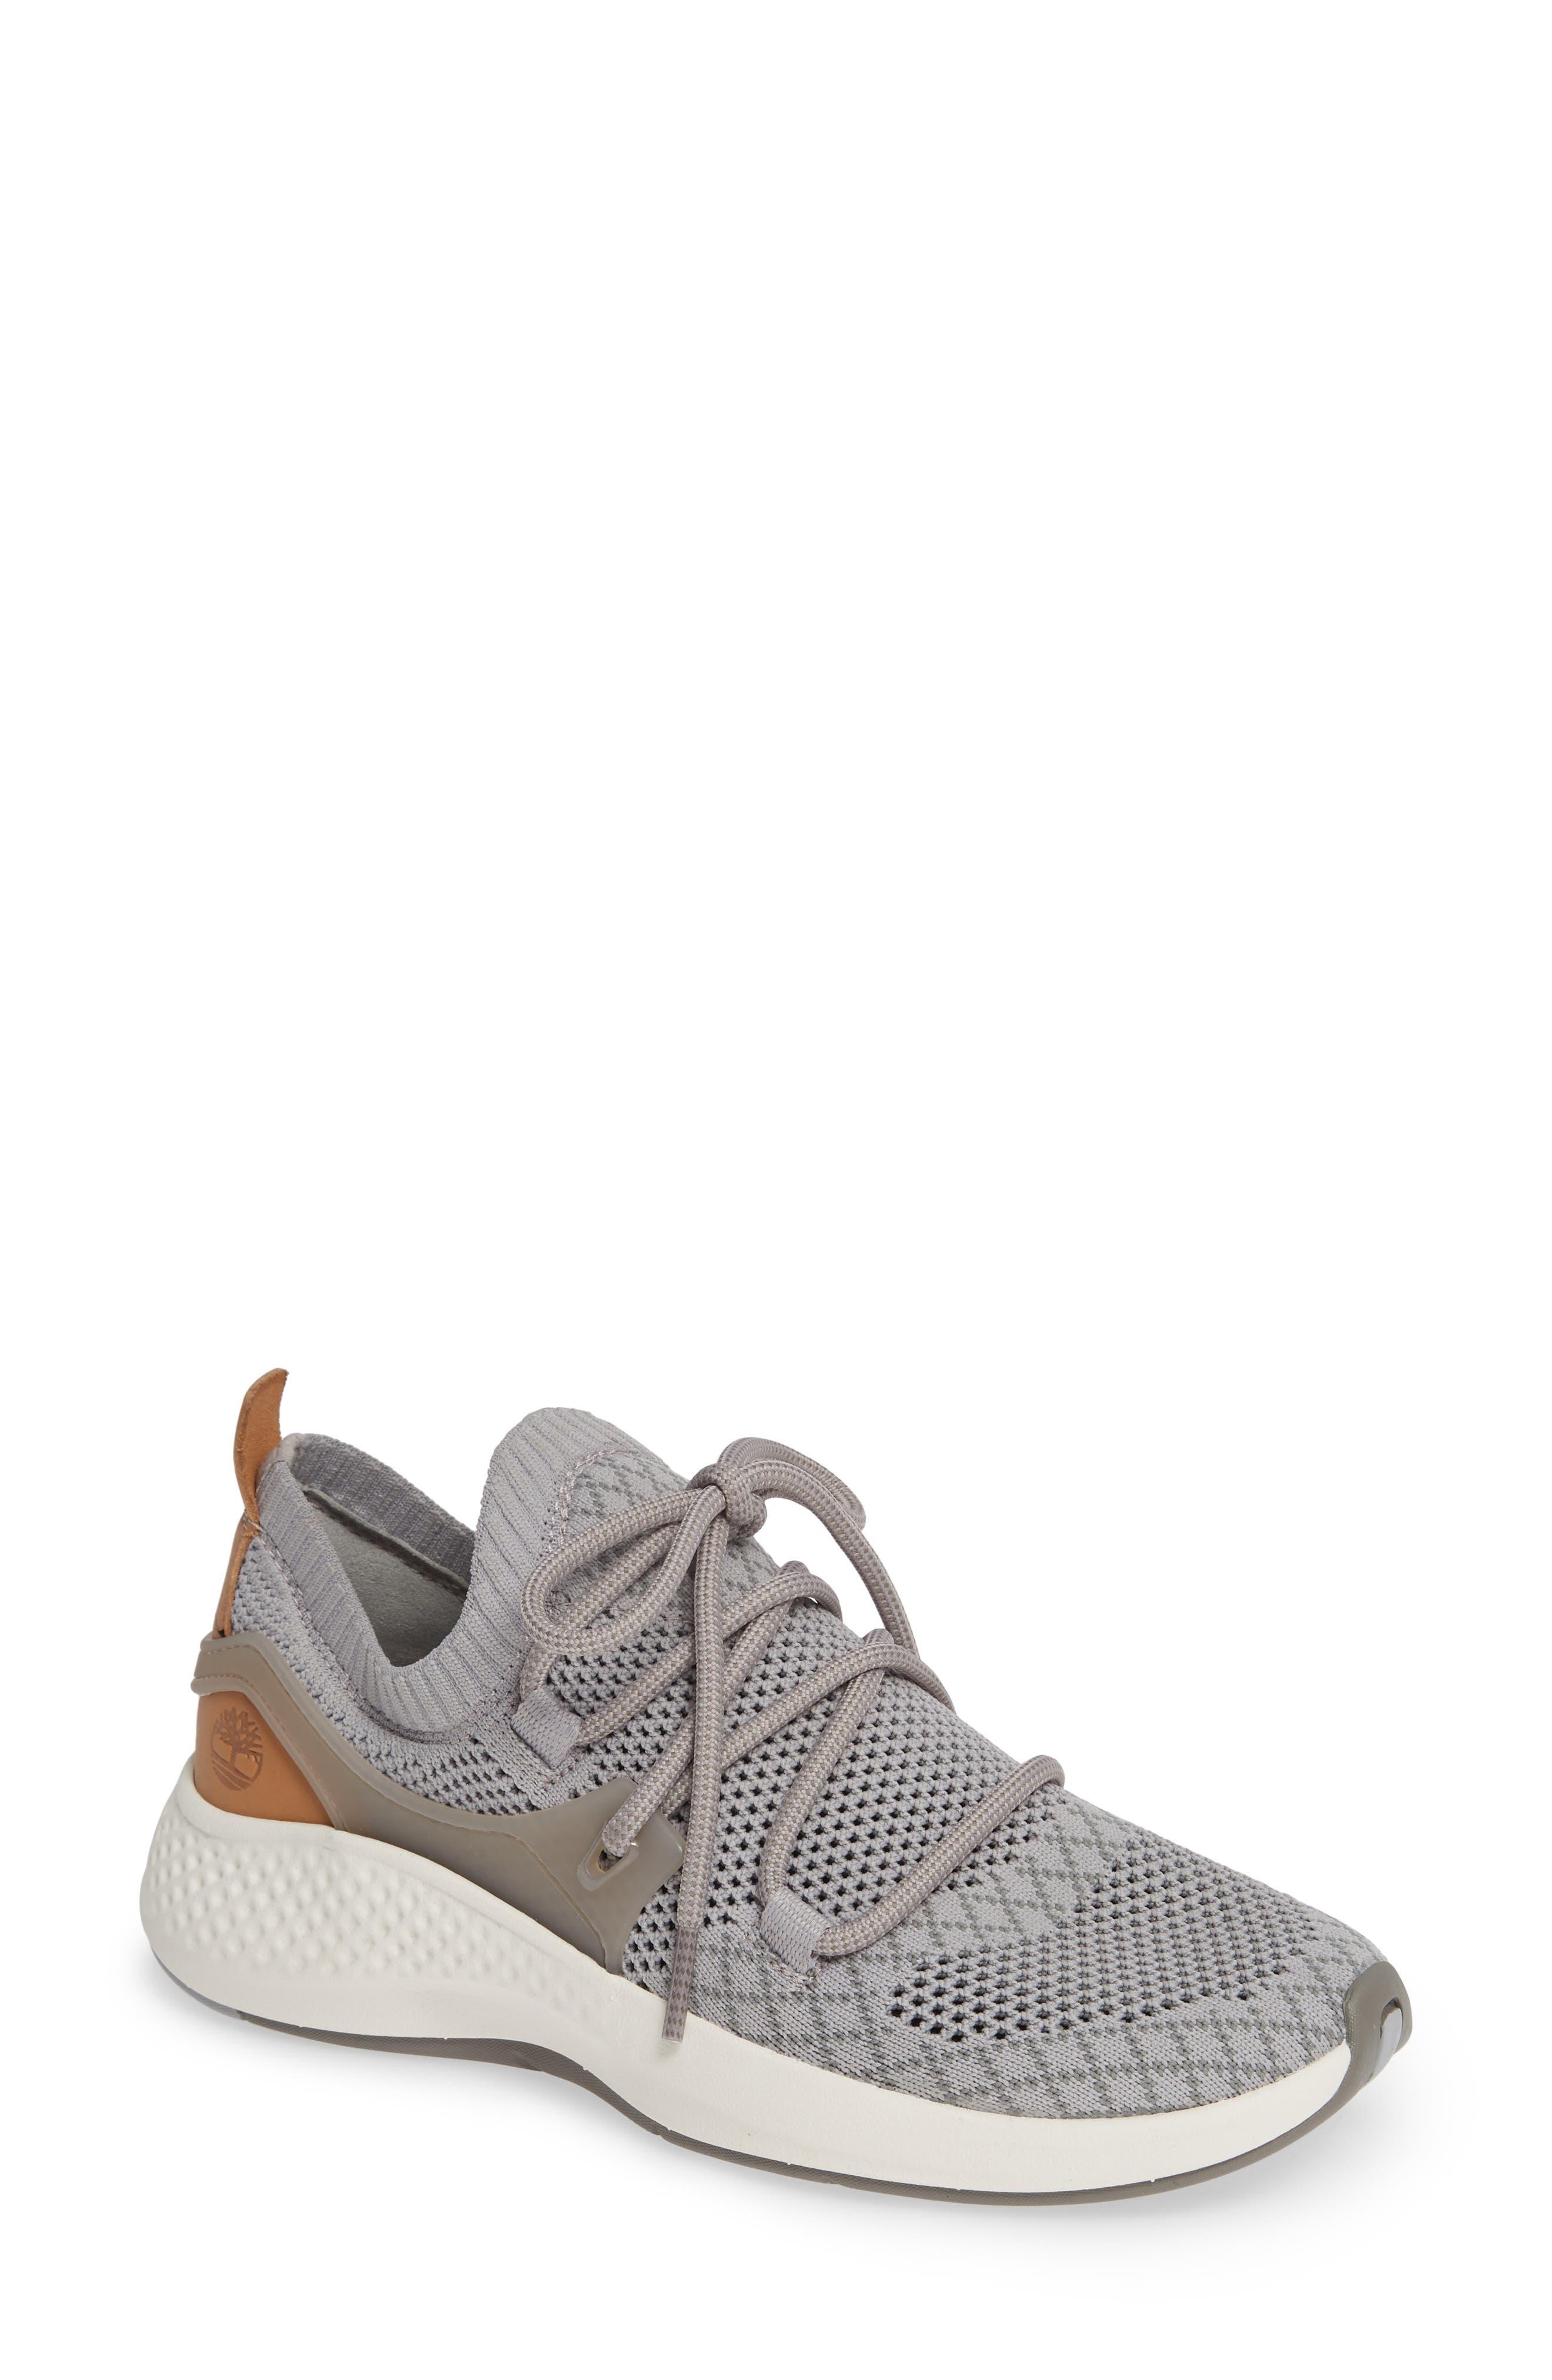 FlyRoam Oxford Sneaker,                             Main thumbnail 1, color,                             065